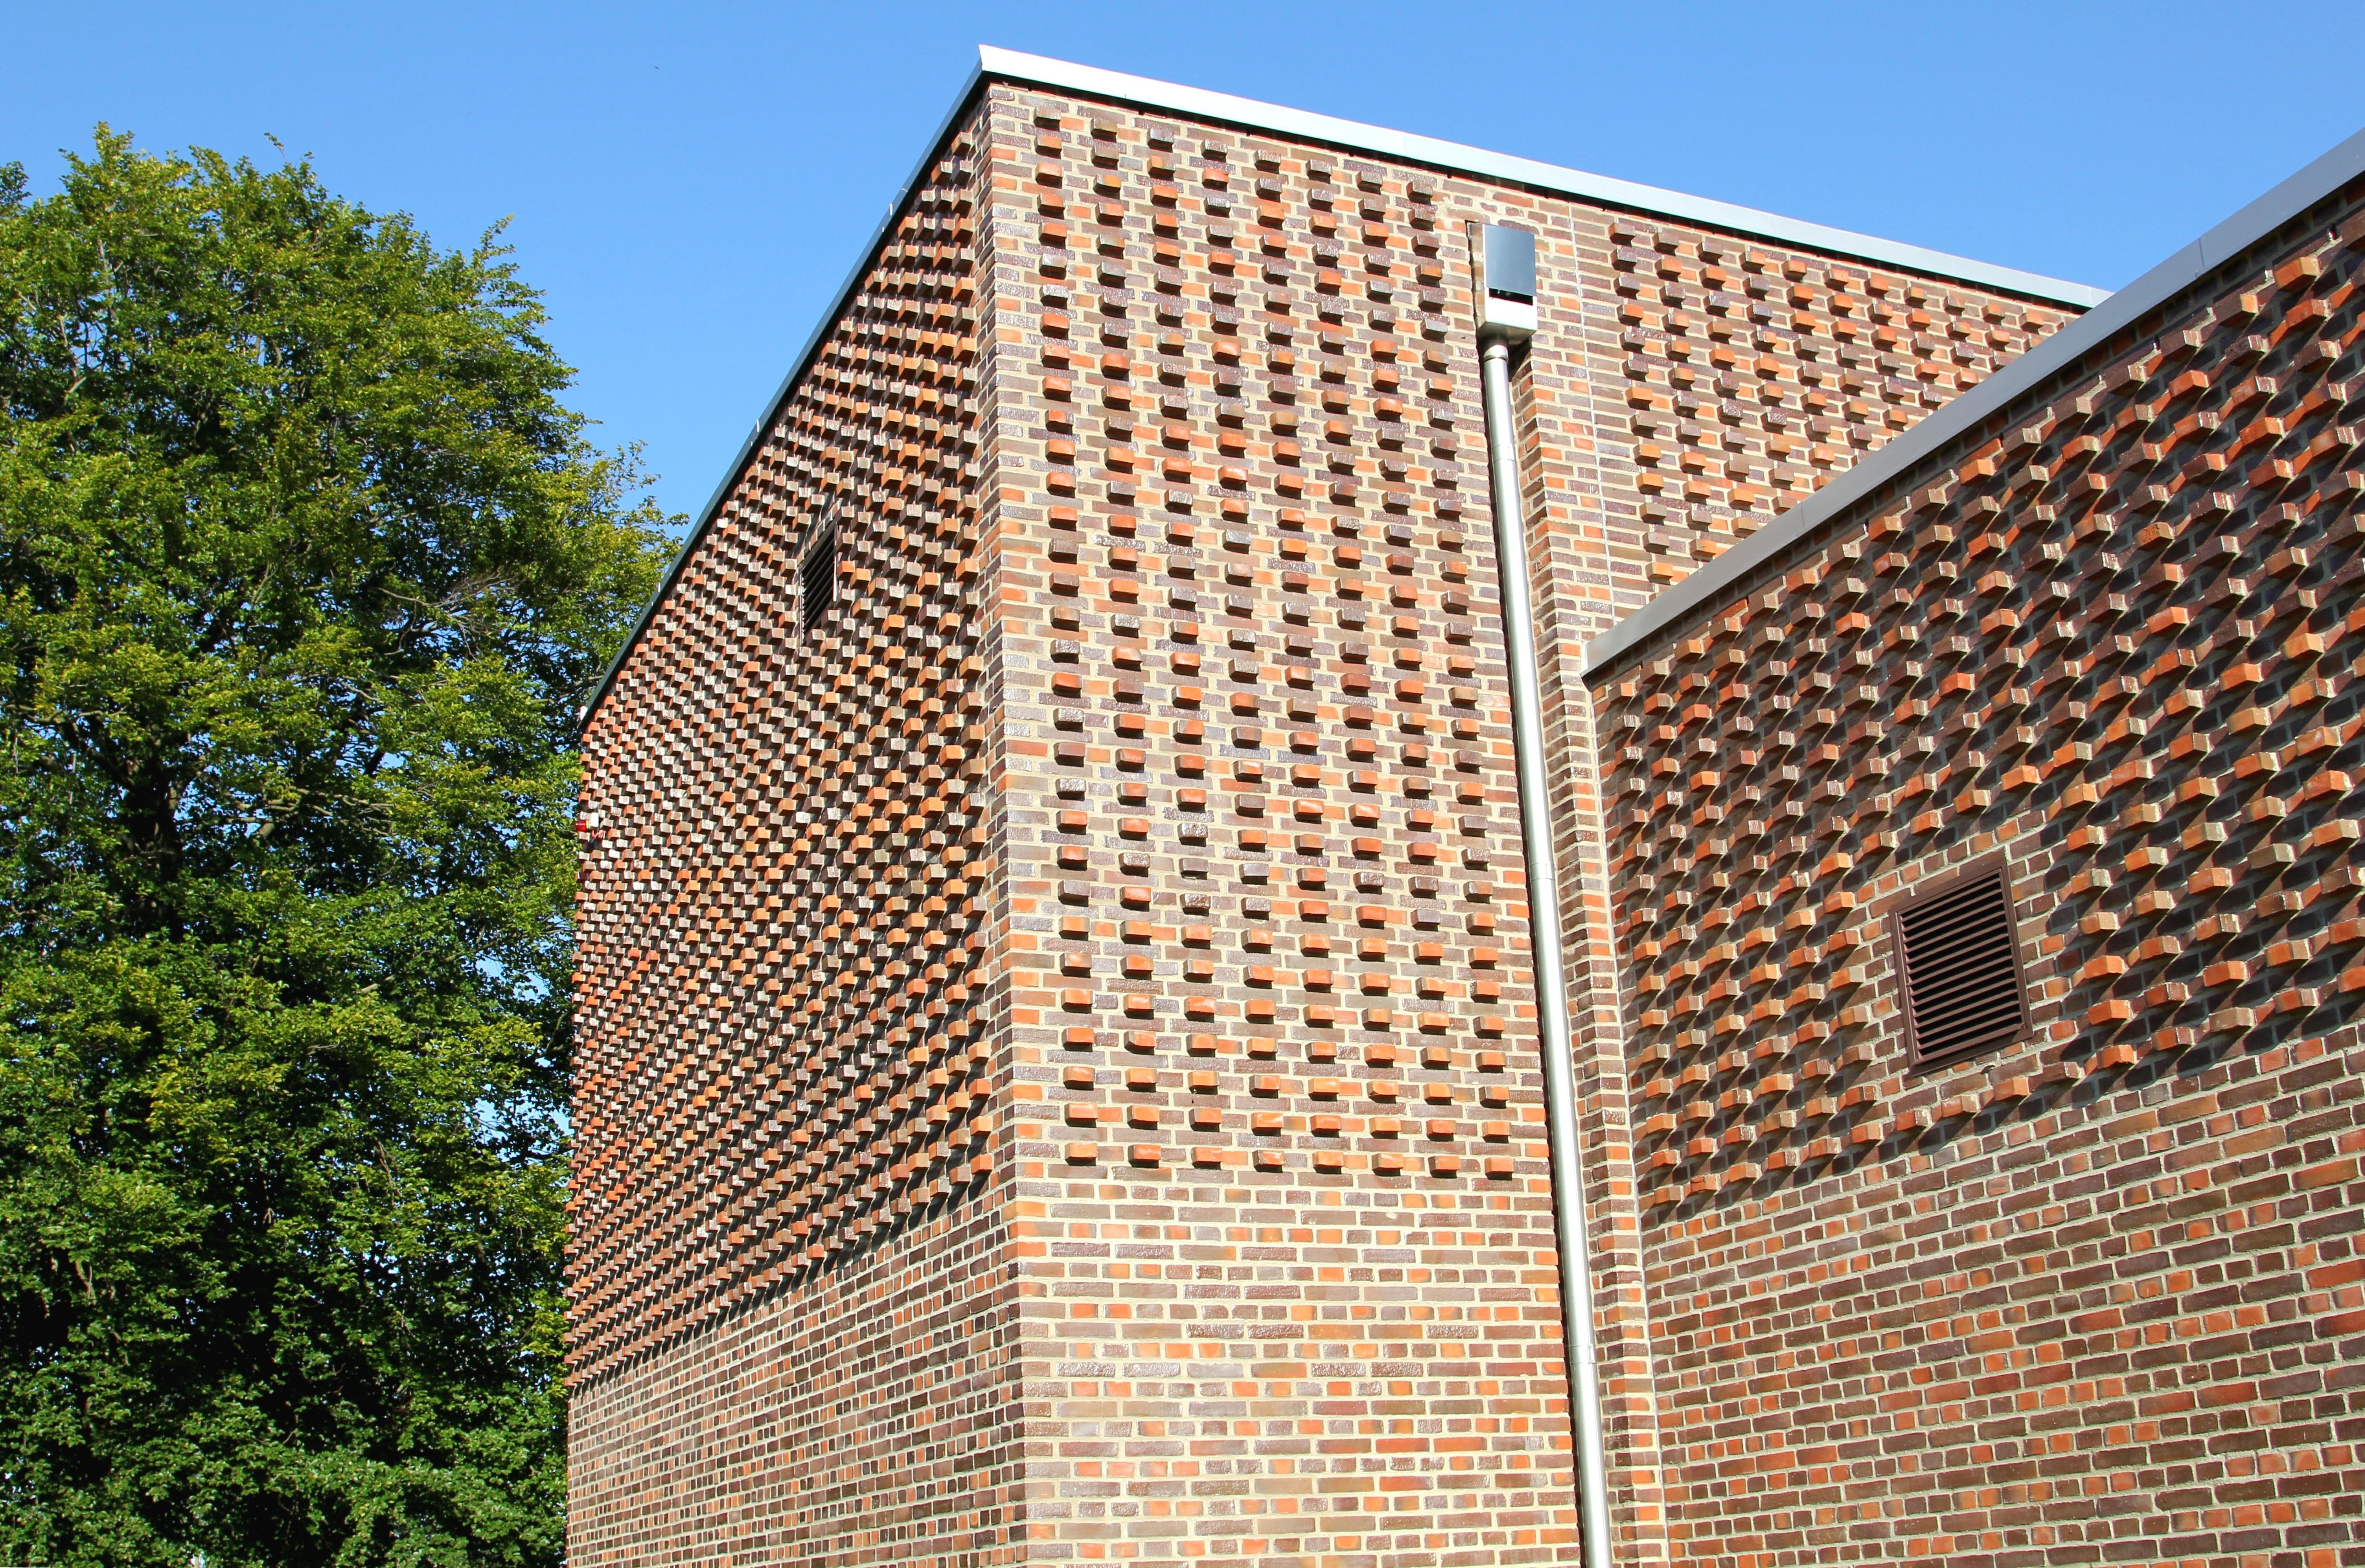 Wood Facade Architecture Design